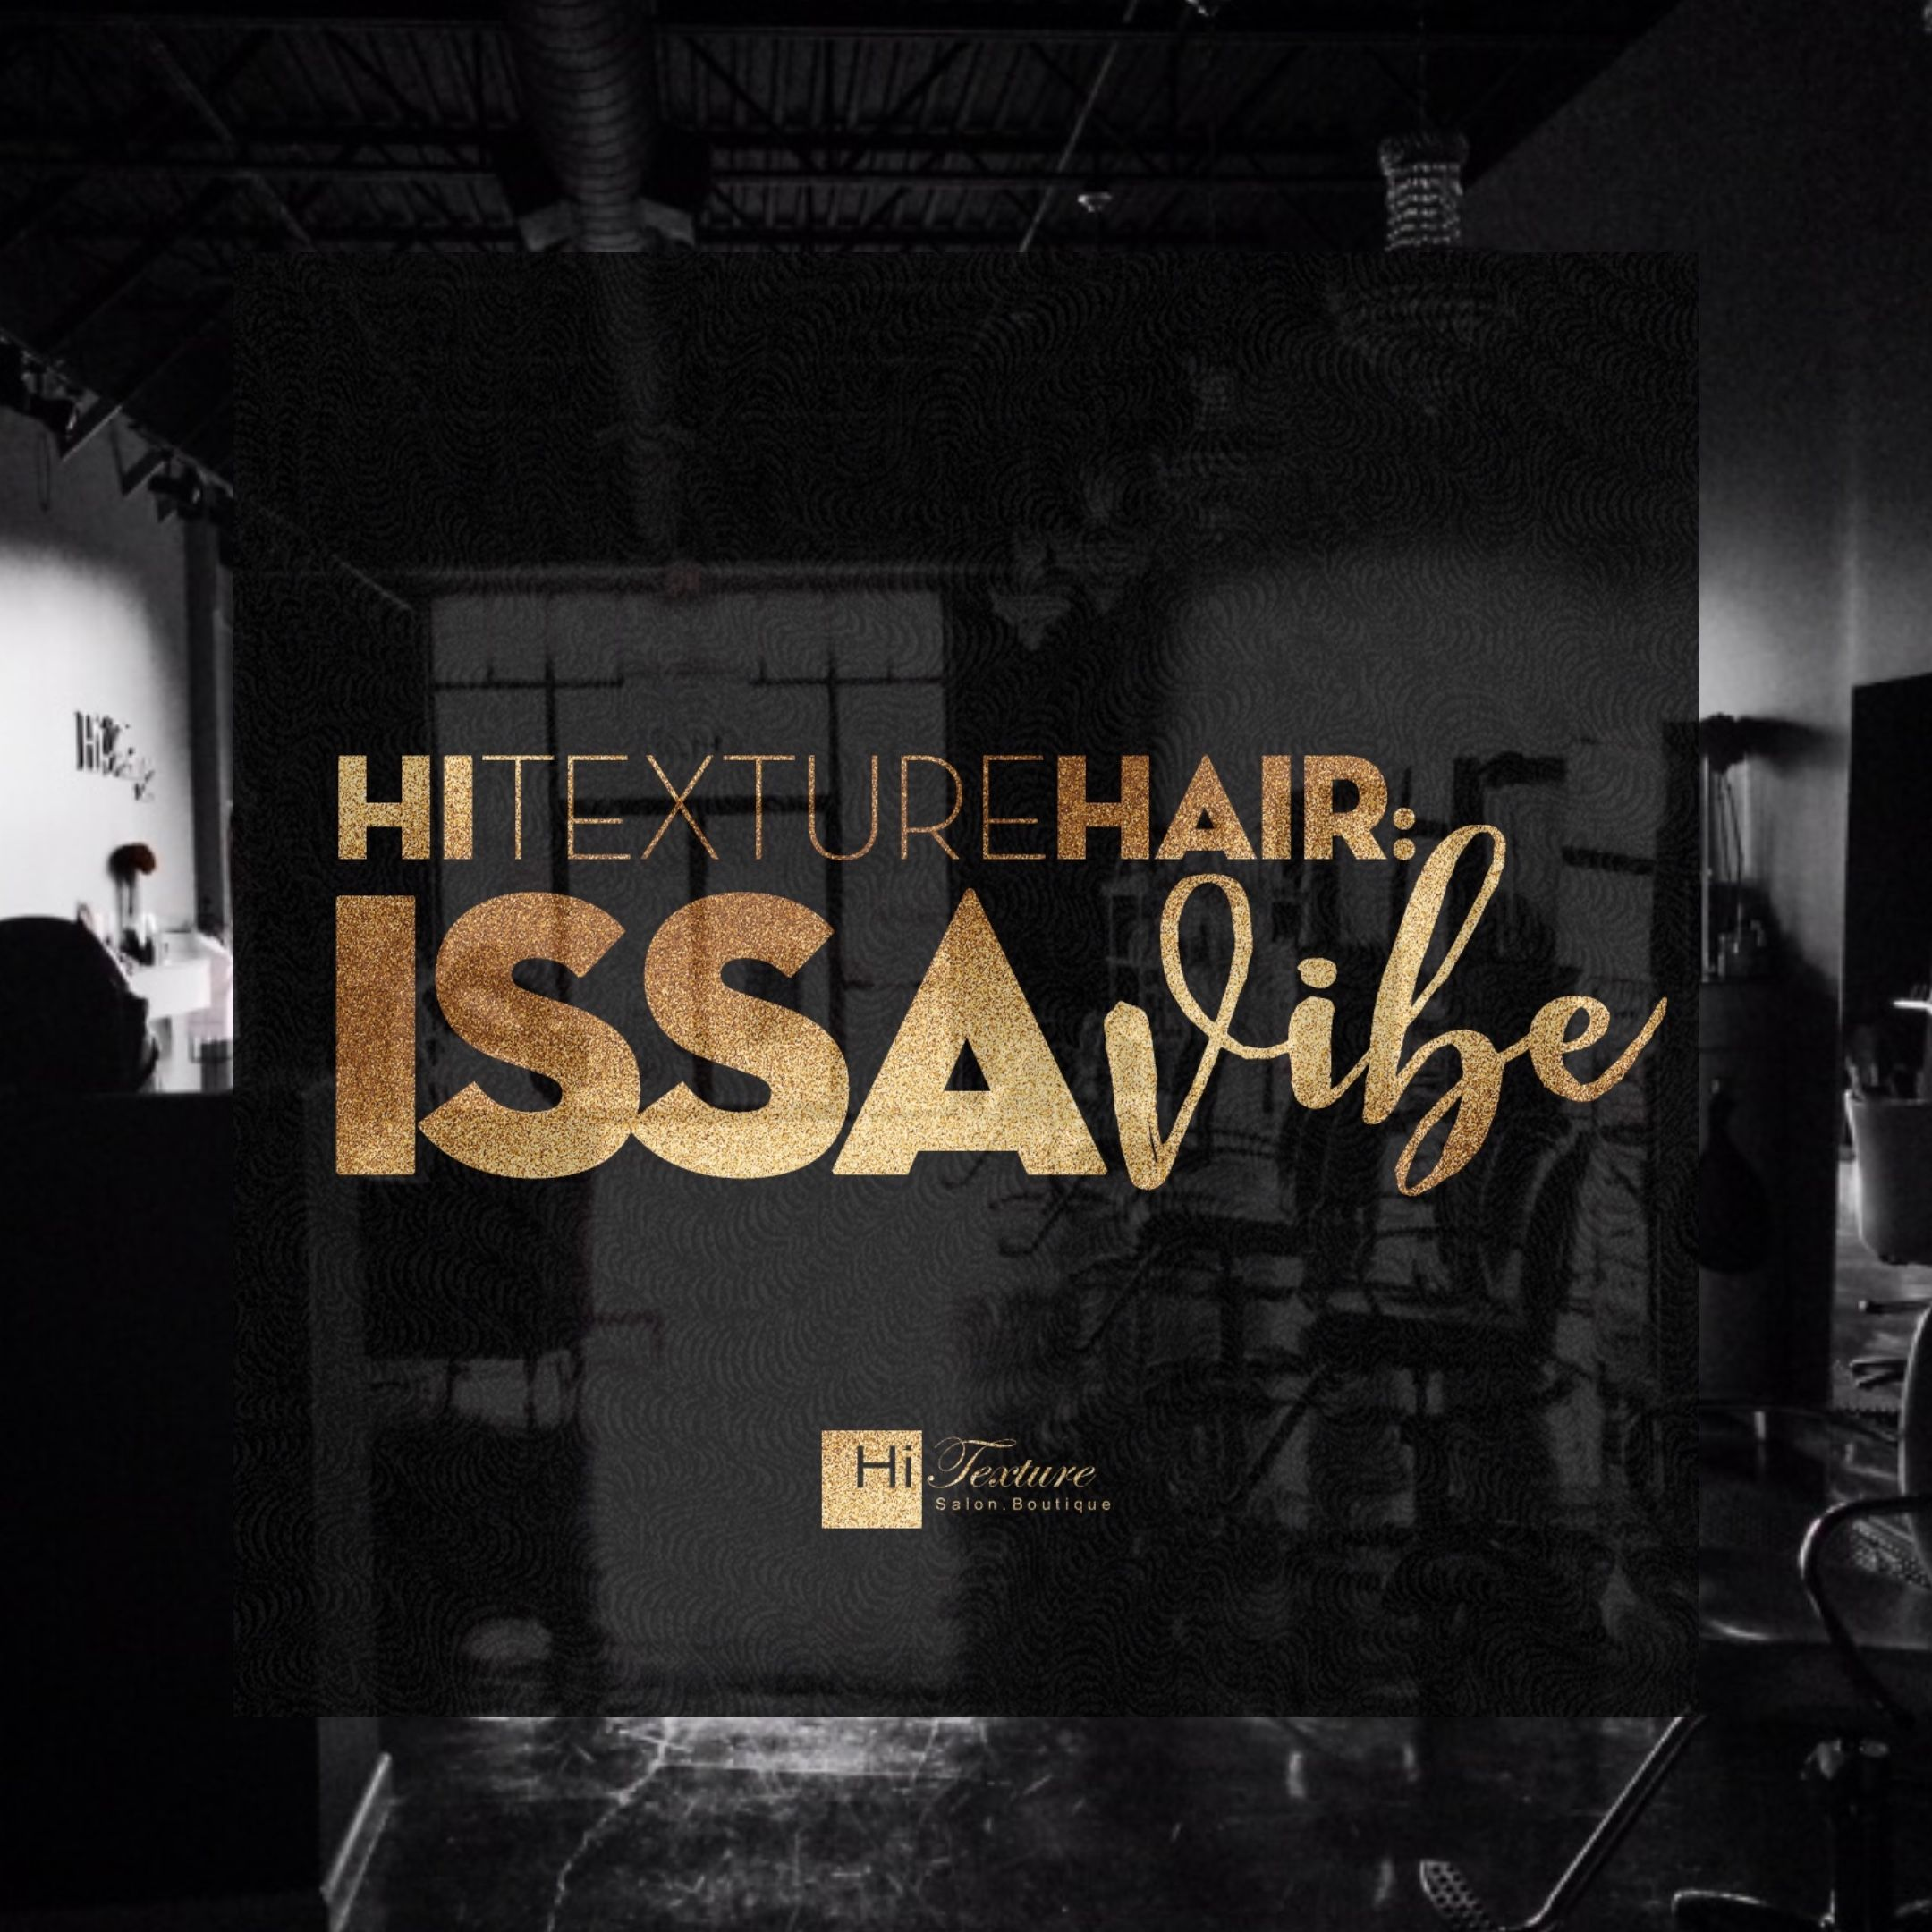 Pin By Hi Texture Hair Salon On The Salon